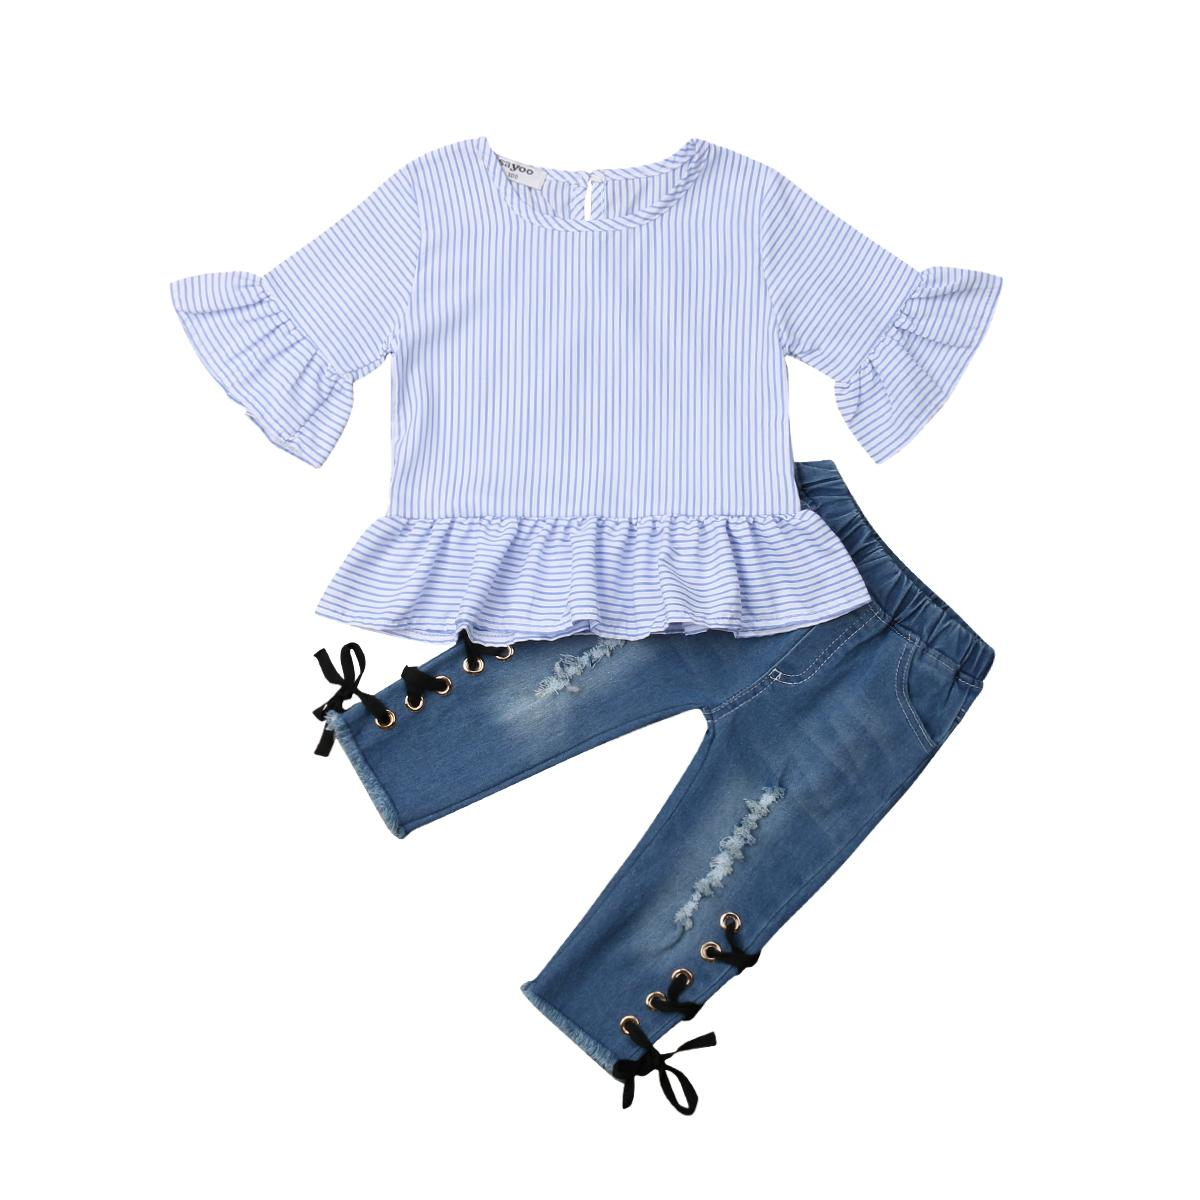 dd91f40cc 2019 Kids Baby Girl Ruffle Striped Chiffon Tops Flare Short Sleeve ...